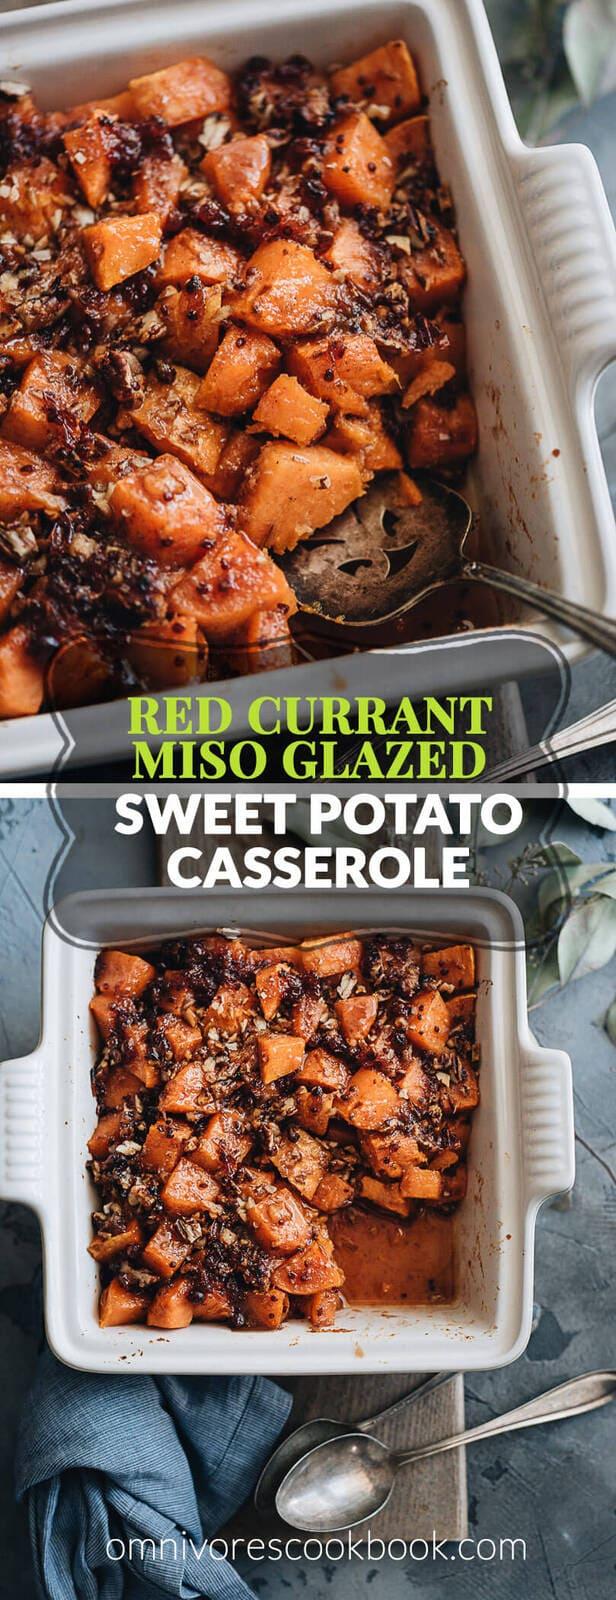 Red Currant Miso Glazed Sweet Potato Casserole - Integrating some Asian elements to make your hearty sweet potato casserole stand out on the Thanksgiving dinner table. #vegetarian #vegan #ad #BEAKITCHENHERO